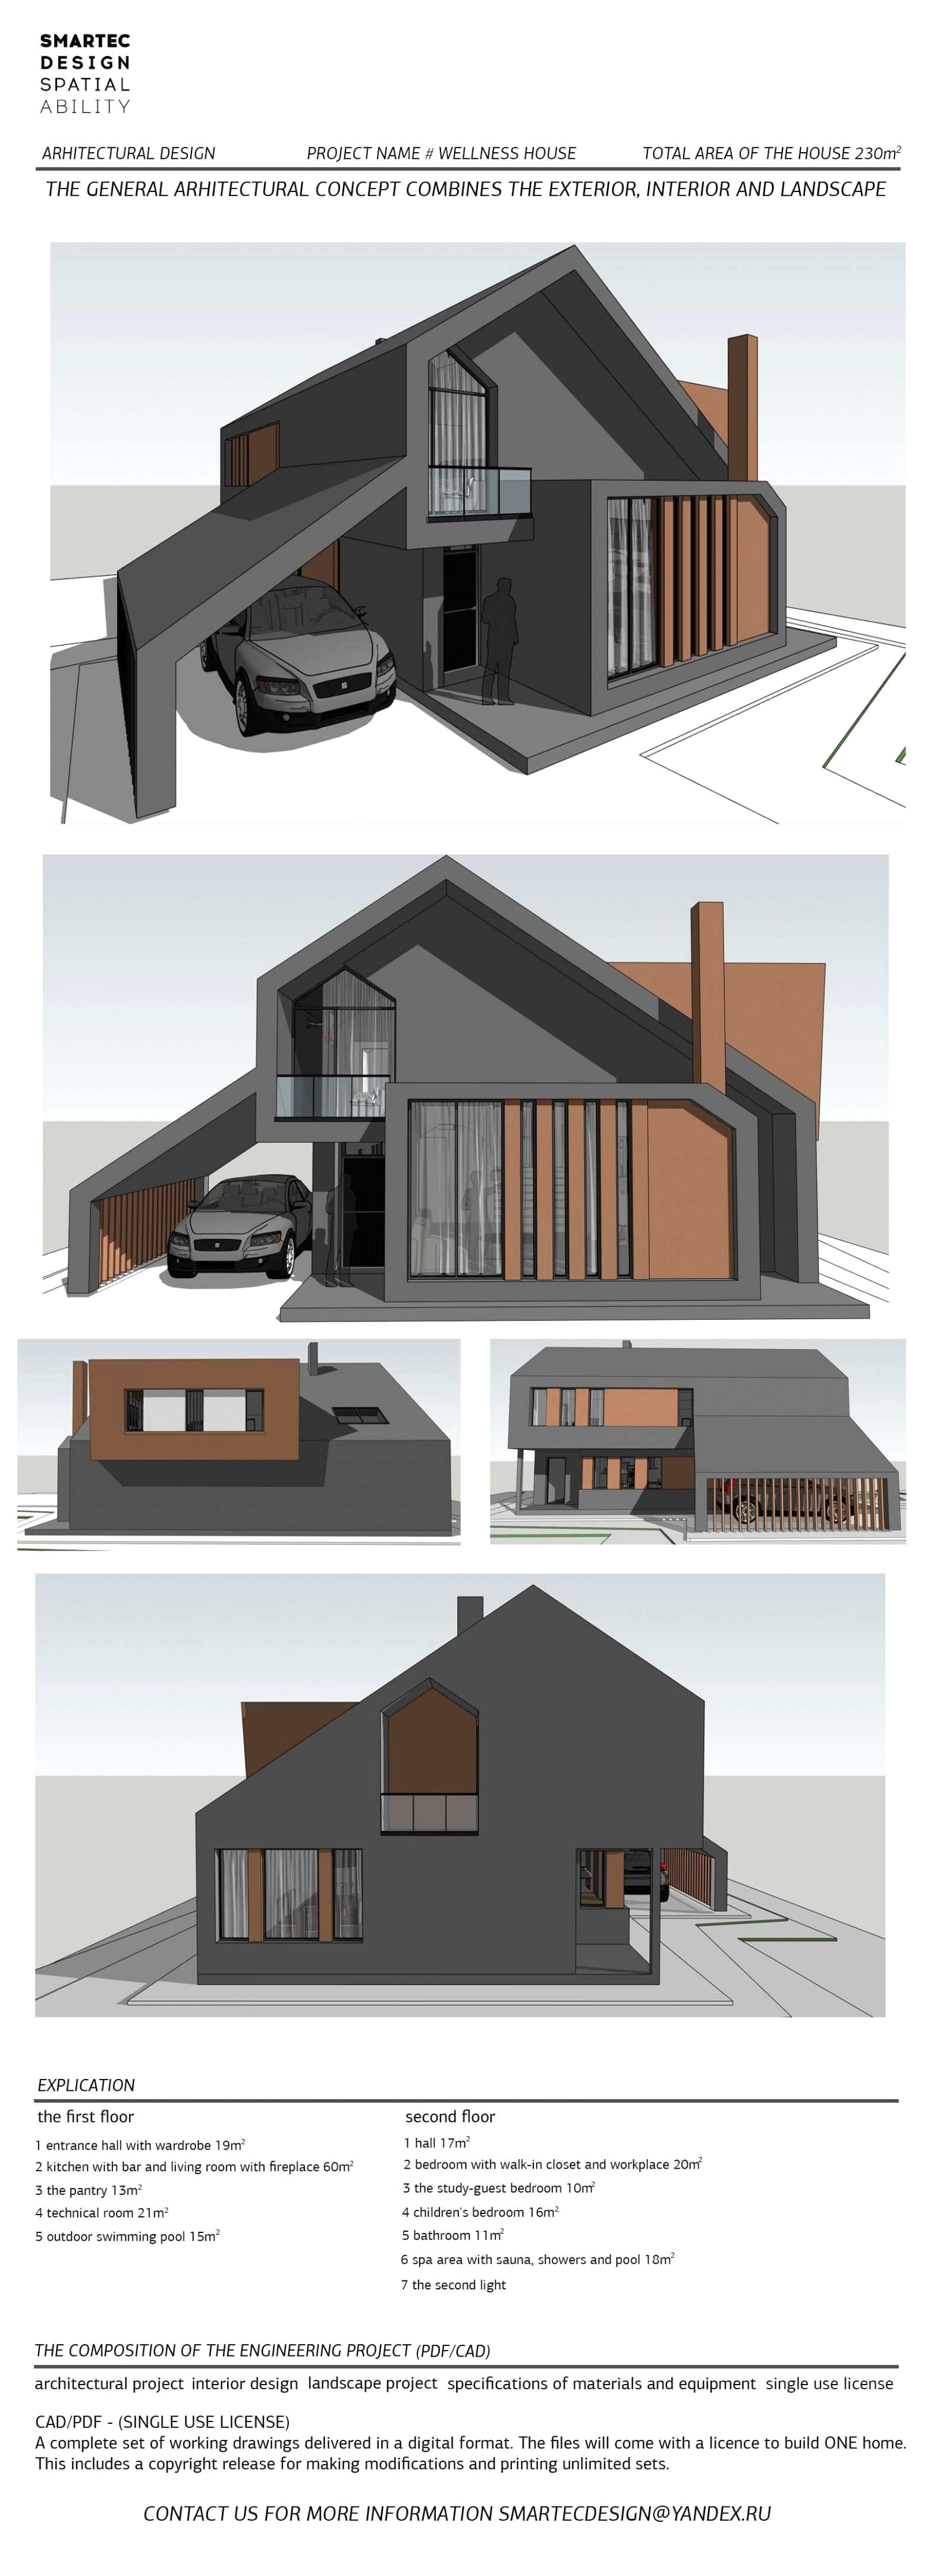 backyard cottage kits fantastic backyard cottage kits graphics